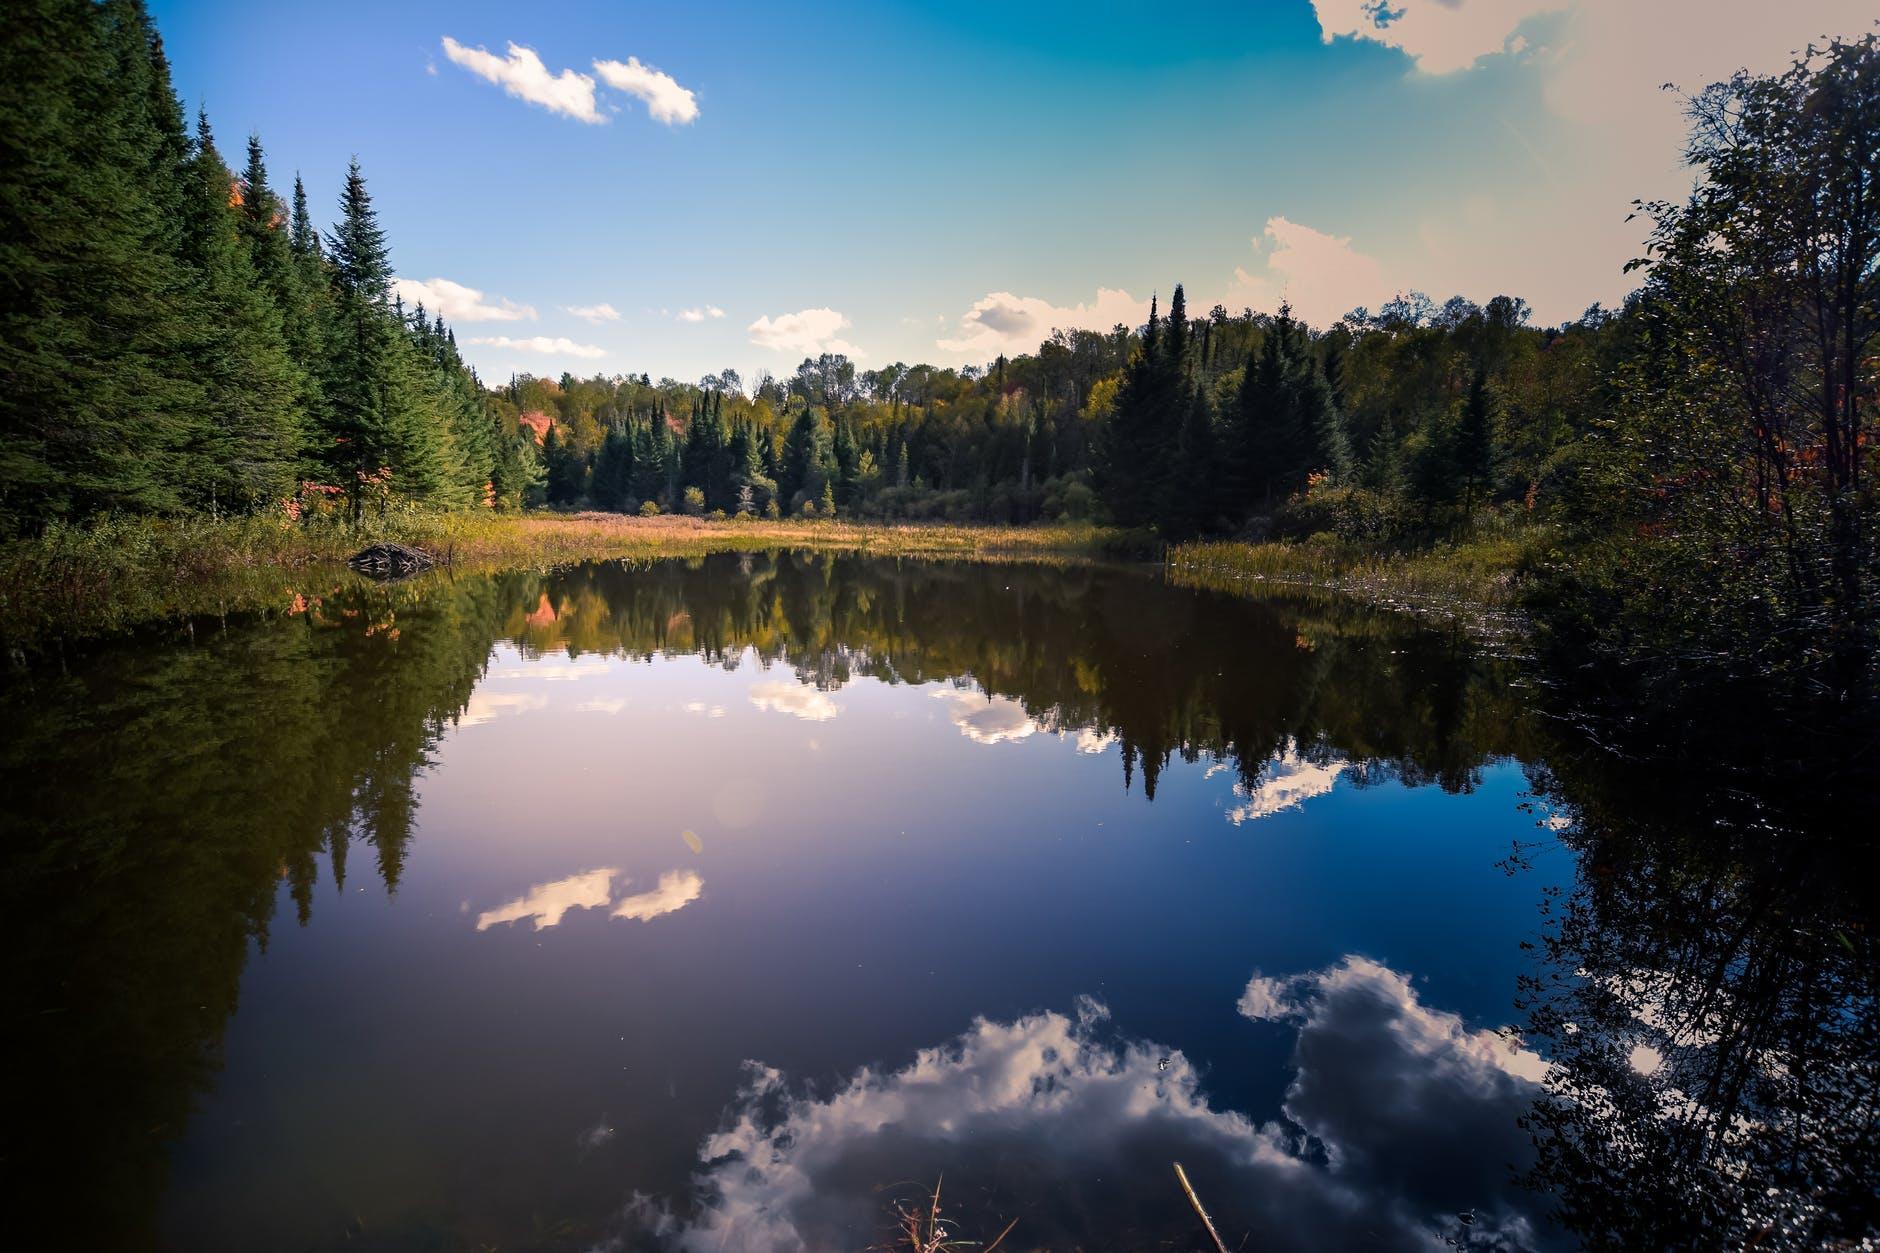 озеро лес природа пейзаж